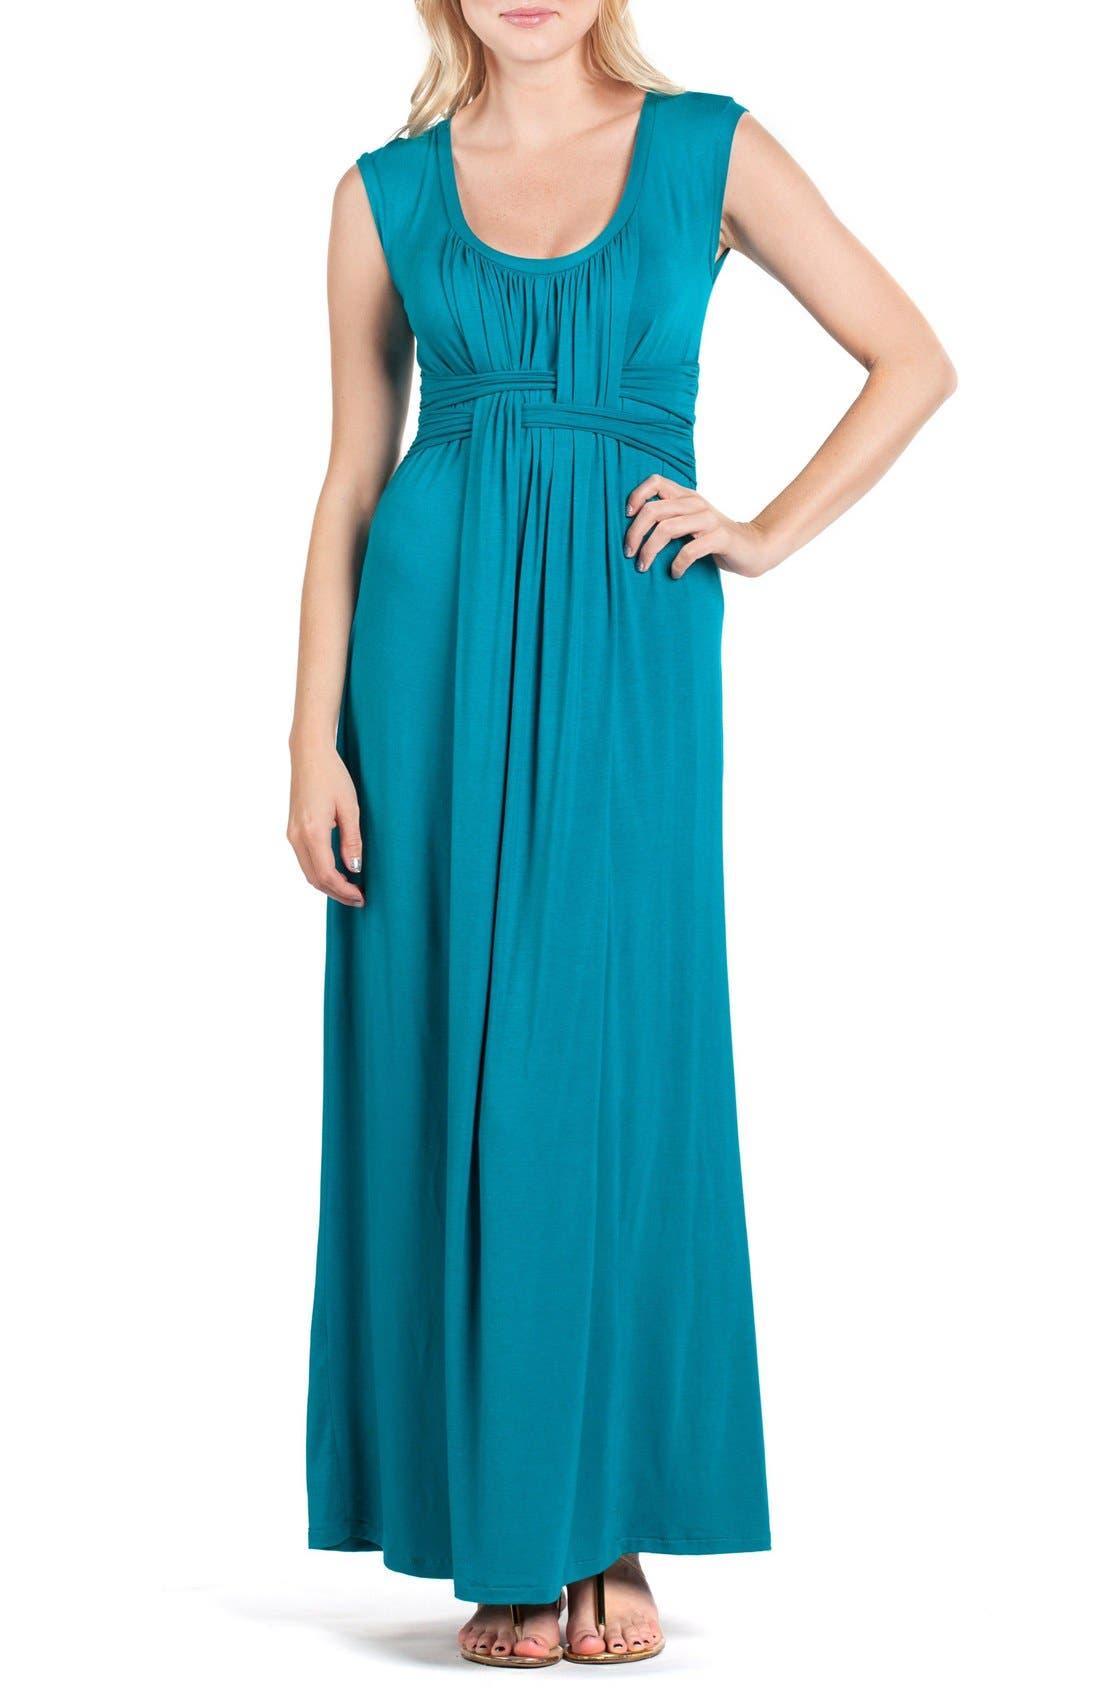 Main Image - Savi Mom Athens Maternity/Nursing Maxi Dress